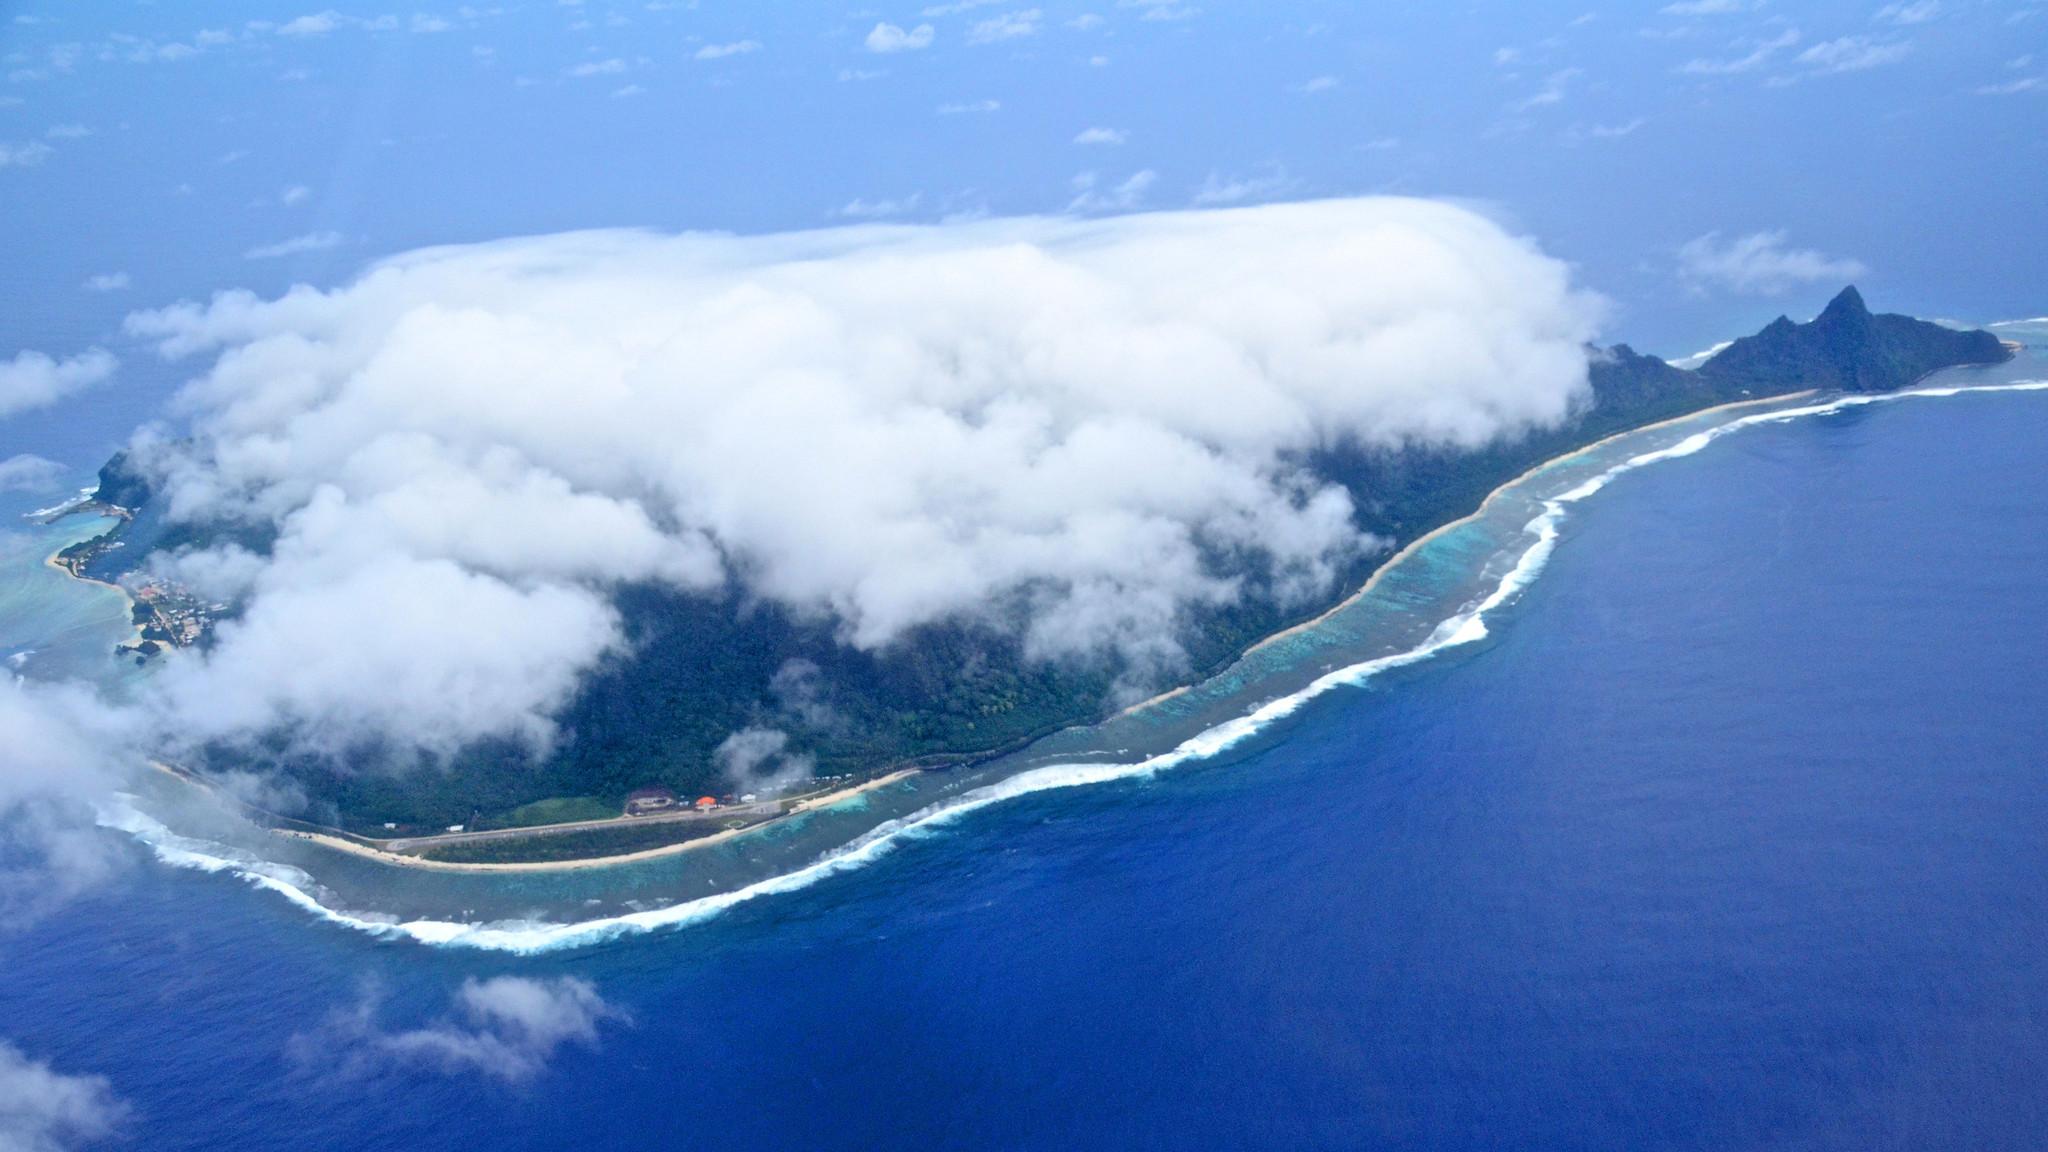 An aerial view of the American Samoa island of Ofu.